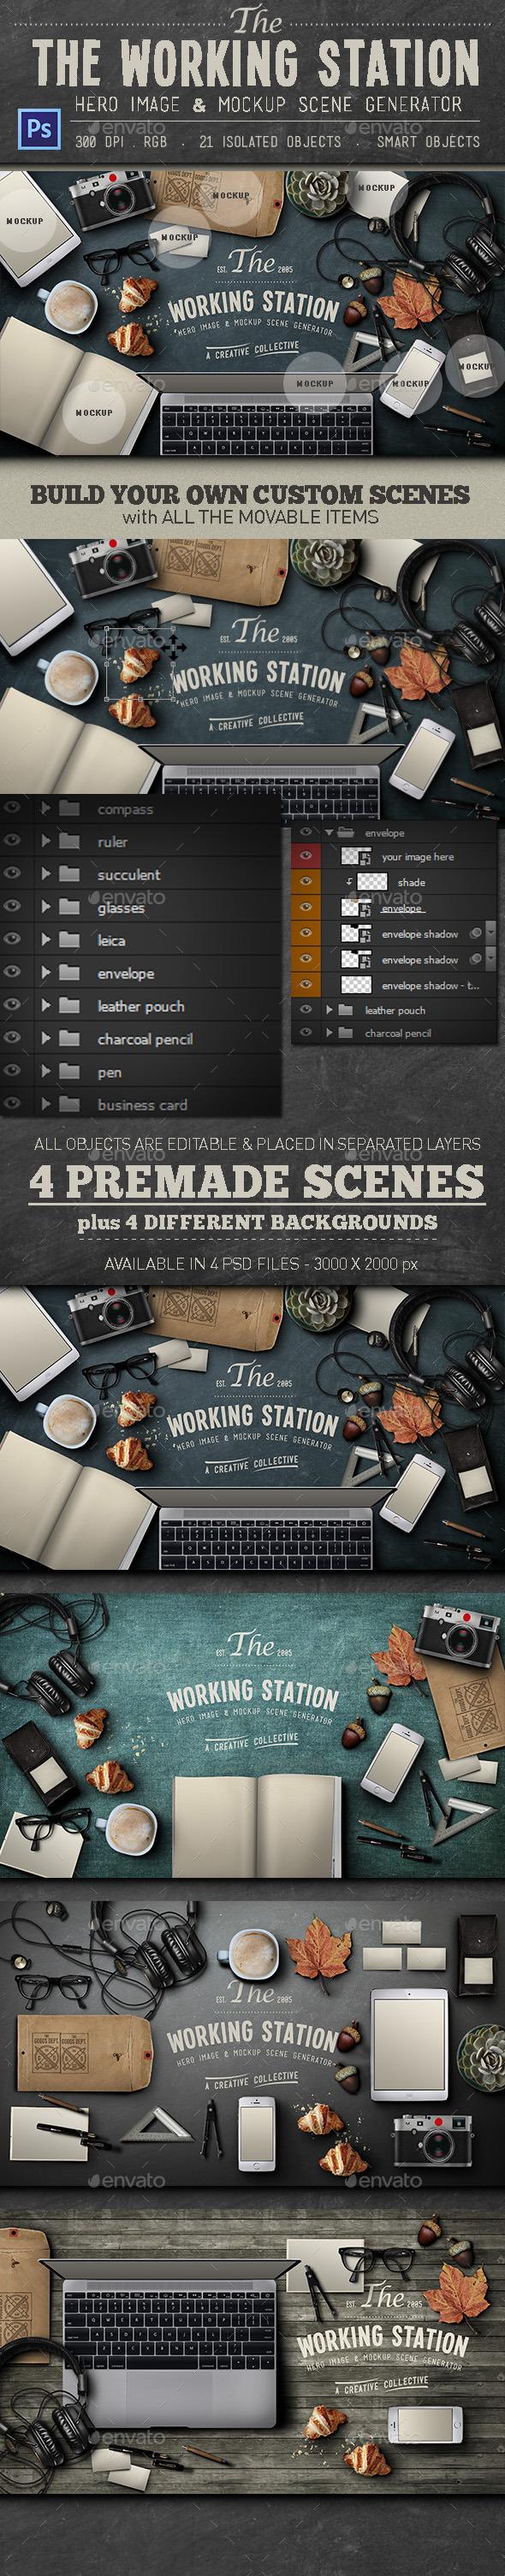 Working Station Hero Image - Hero Images Graphics